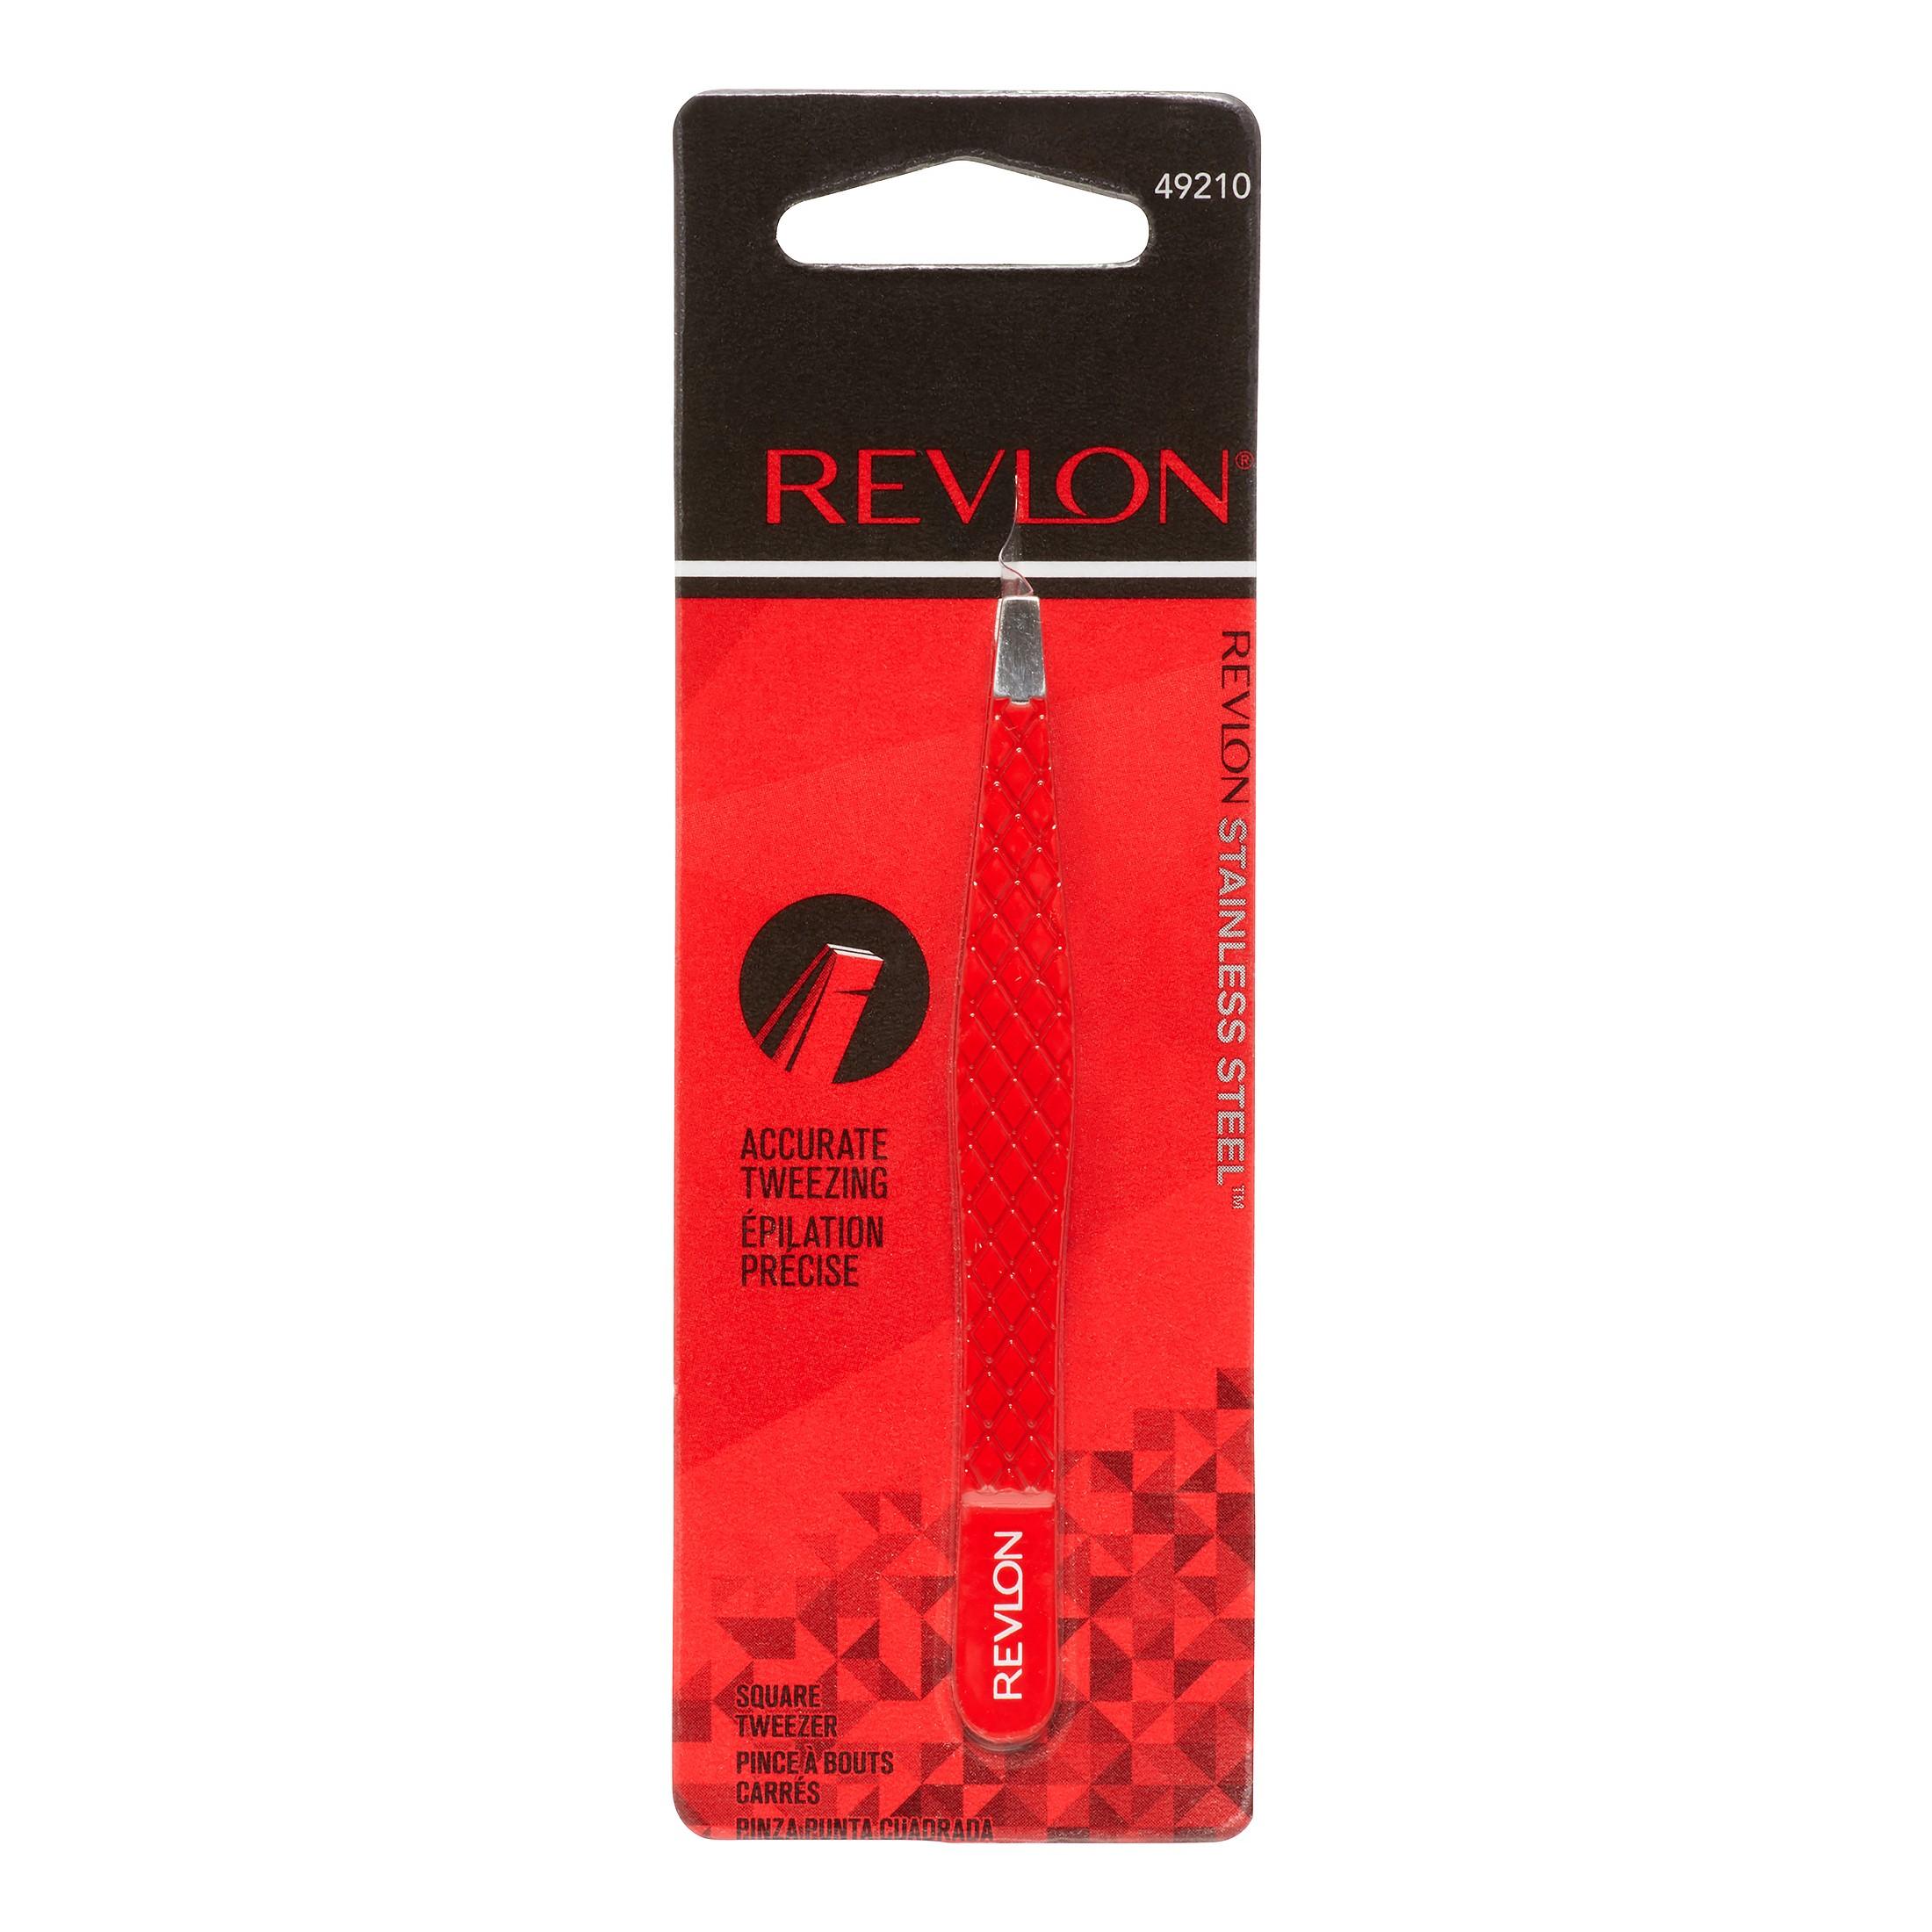 Revlon Expert Tweezer Square Tip